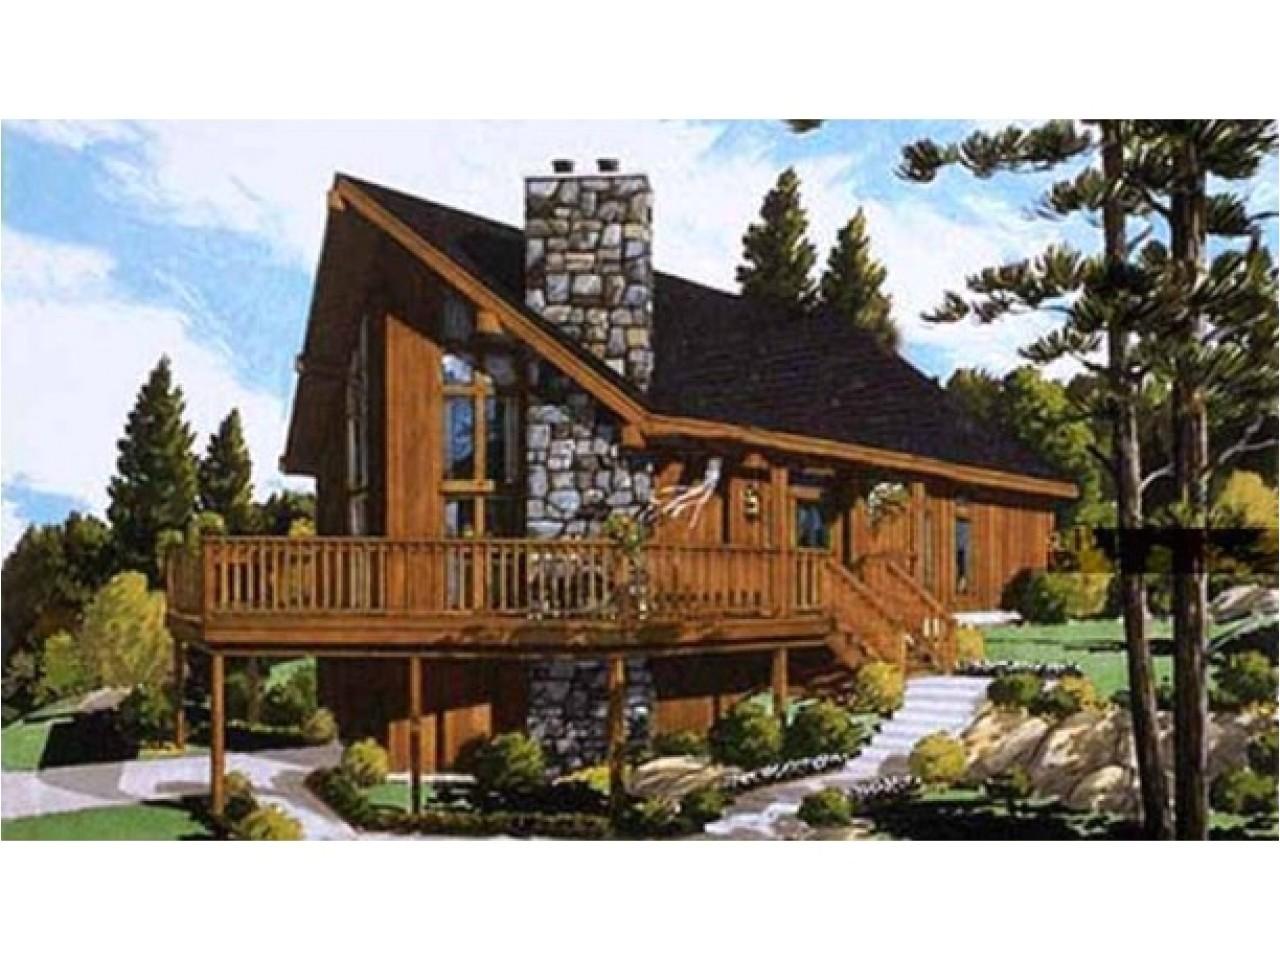 b1ced4e1b4a58e16 chalet style homes floor plans chalet house plans